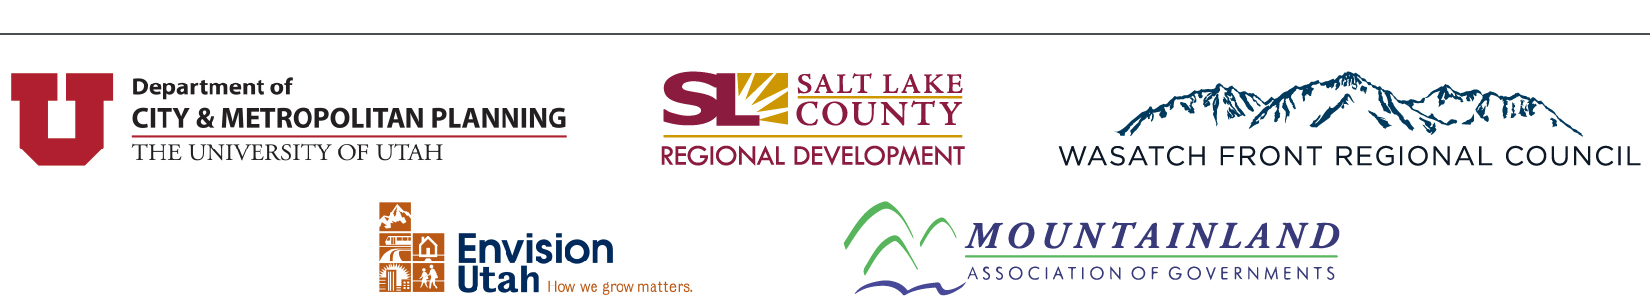 Event organizers' logos.